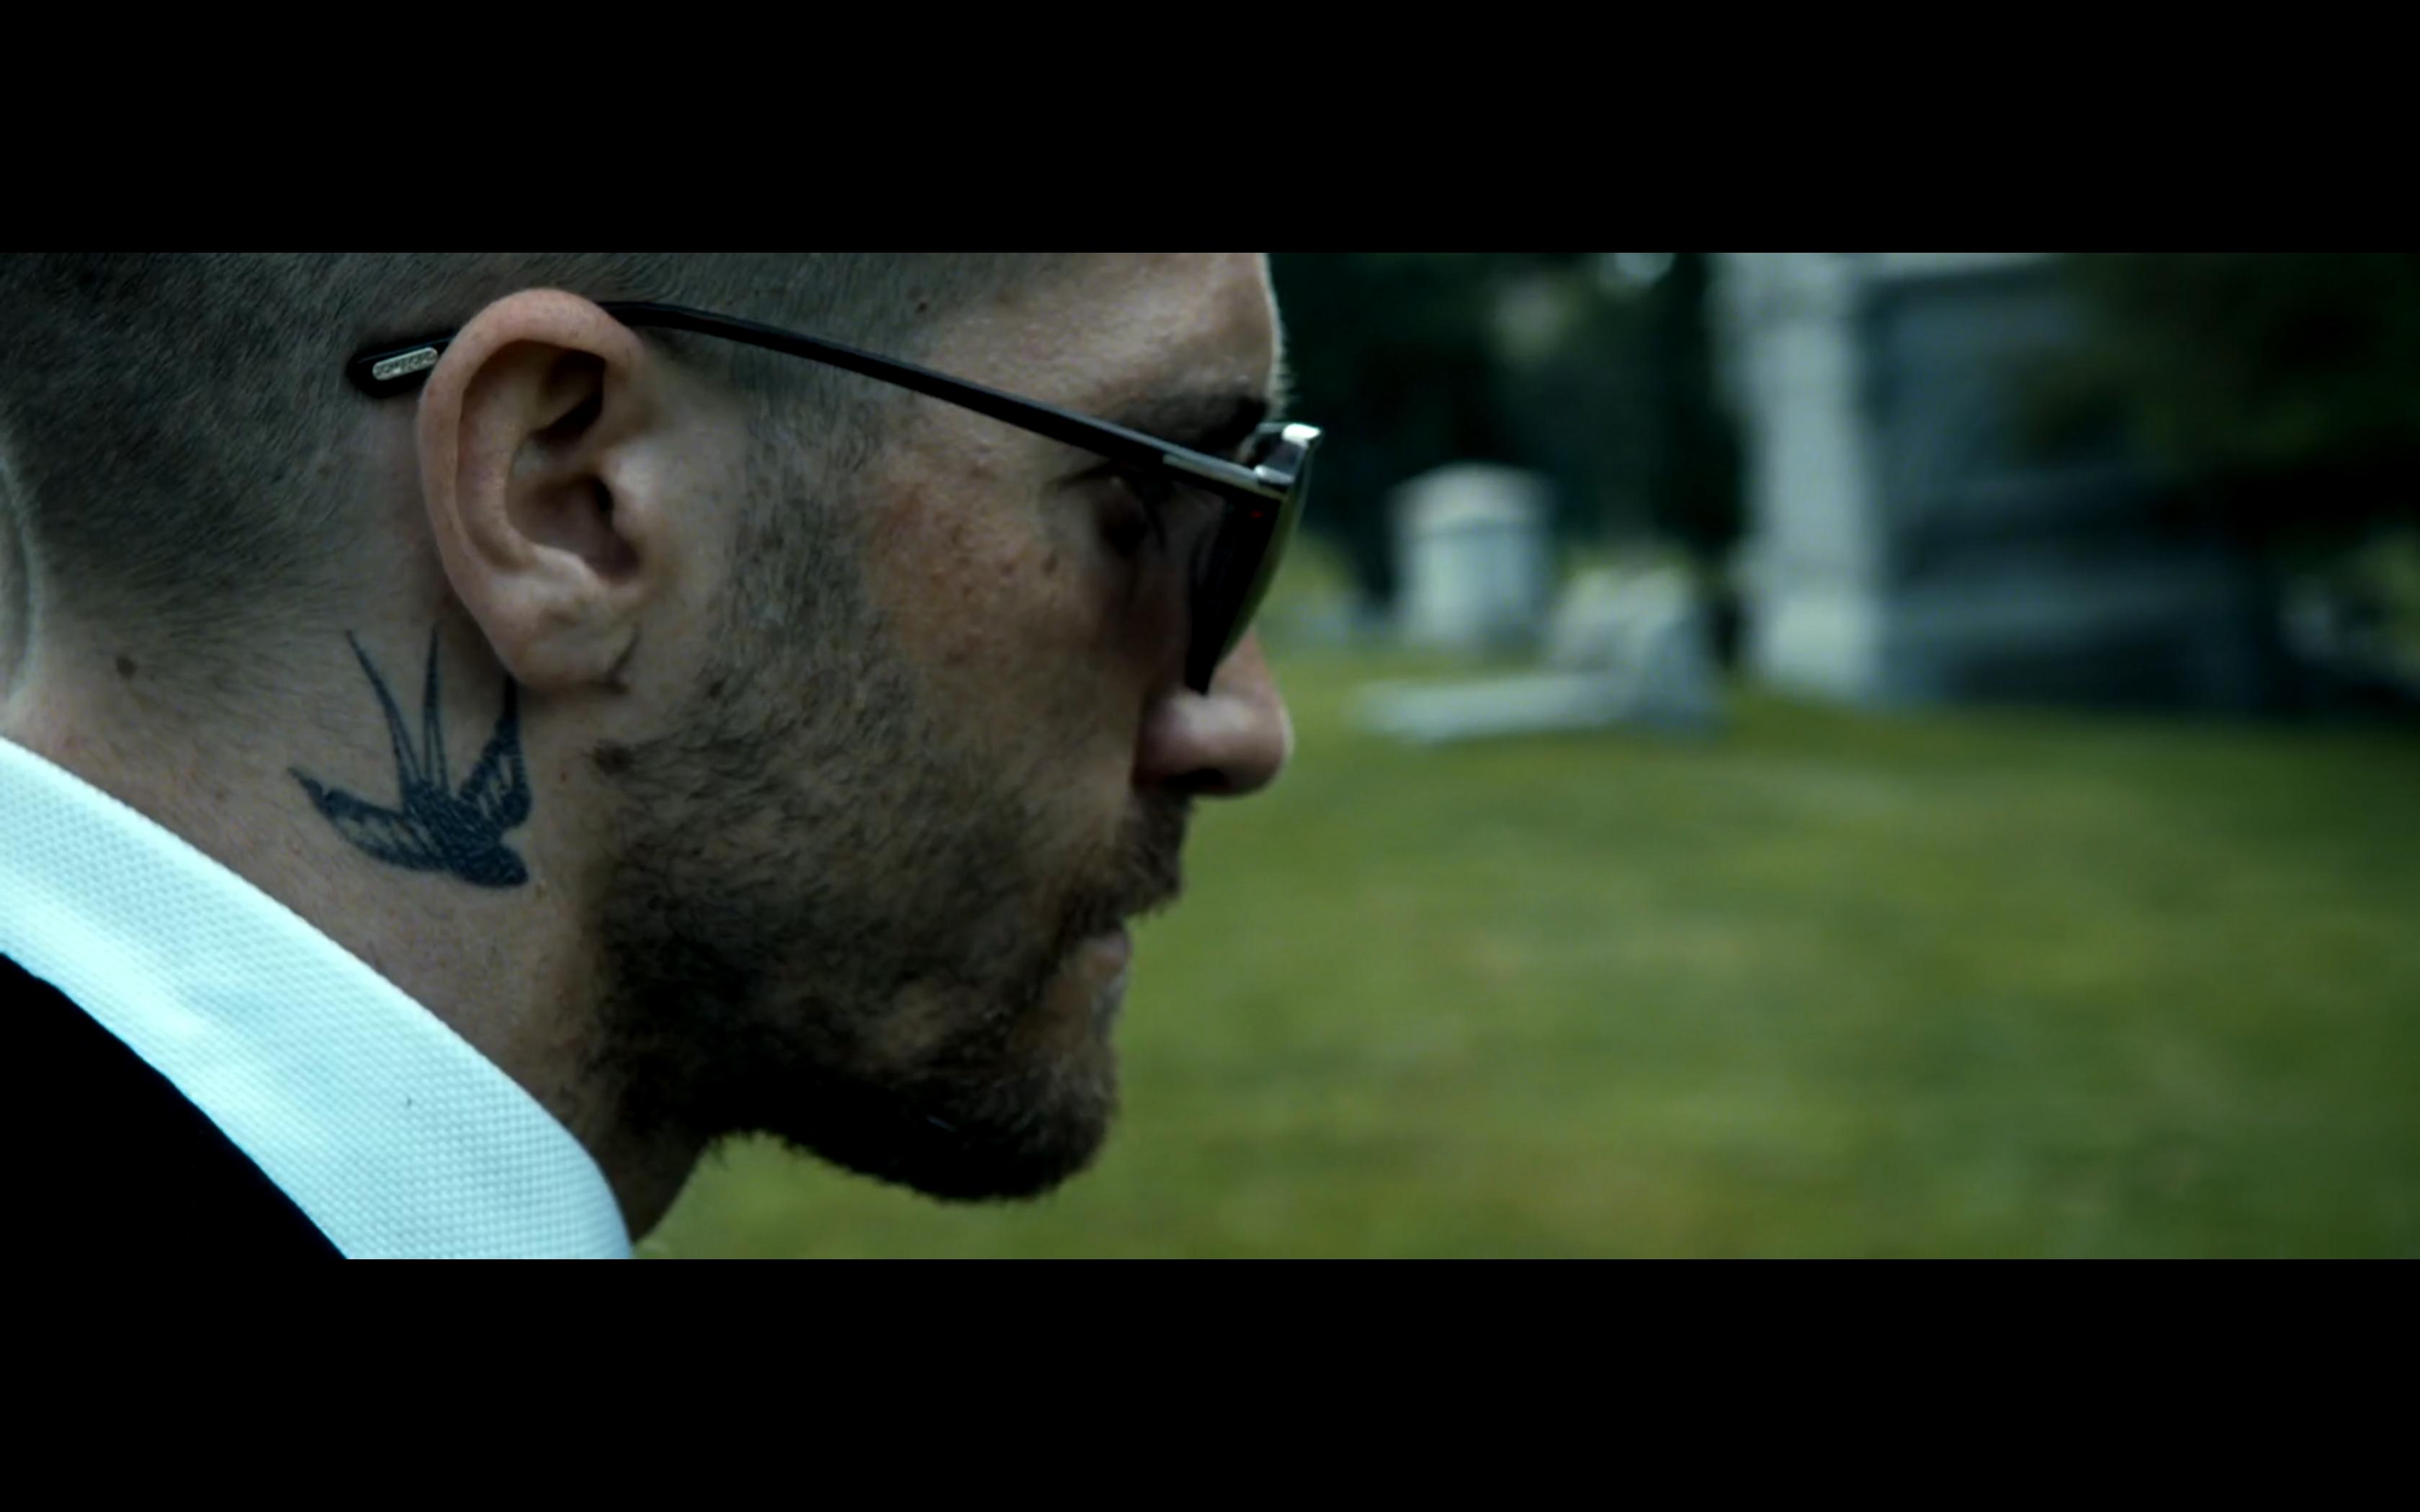 Southpaw Movie Billy Hope Jake Gyllenhaal Tom Ford Sunglasses Bird Tattoo Bird Tattoo Neck Hope Tattoo Neck Tattoo For Guys